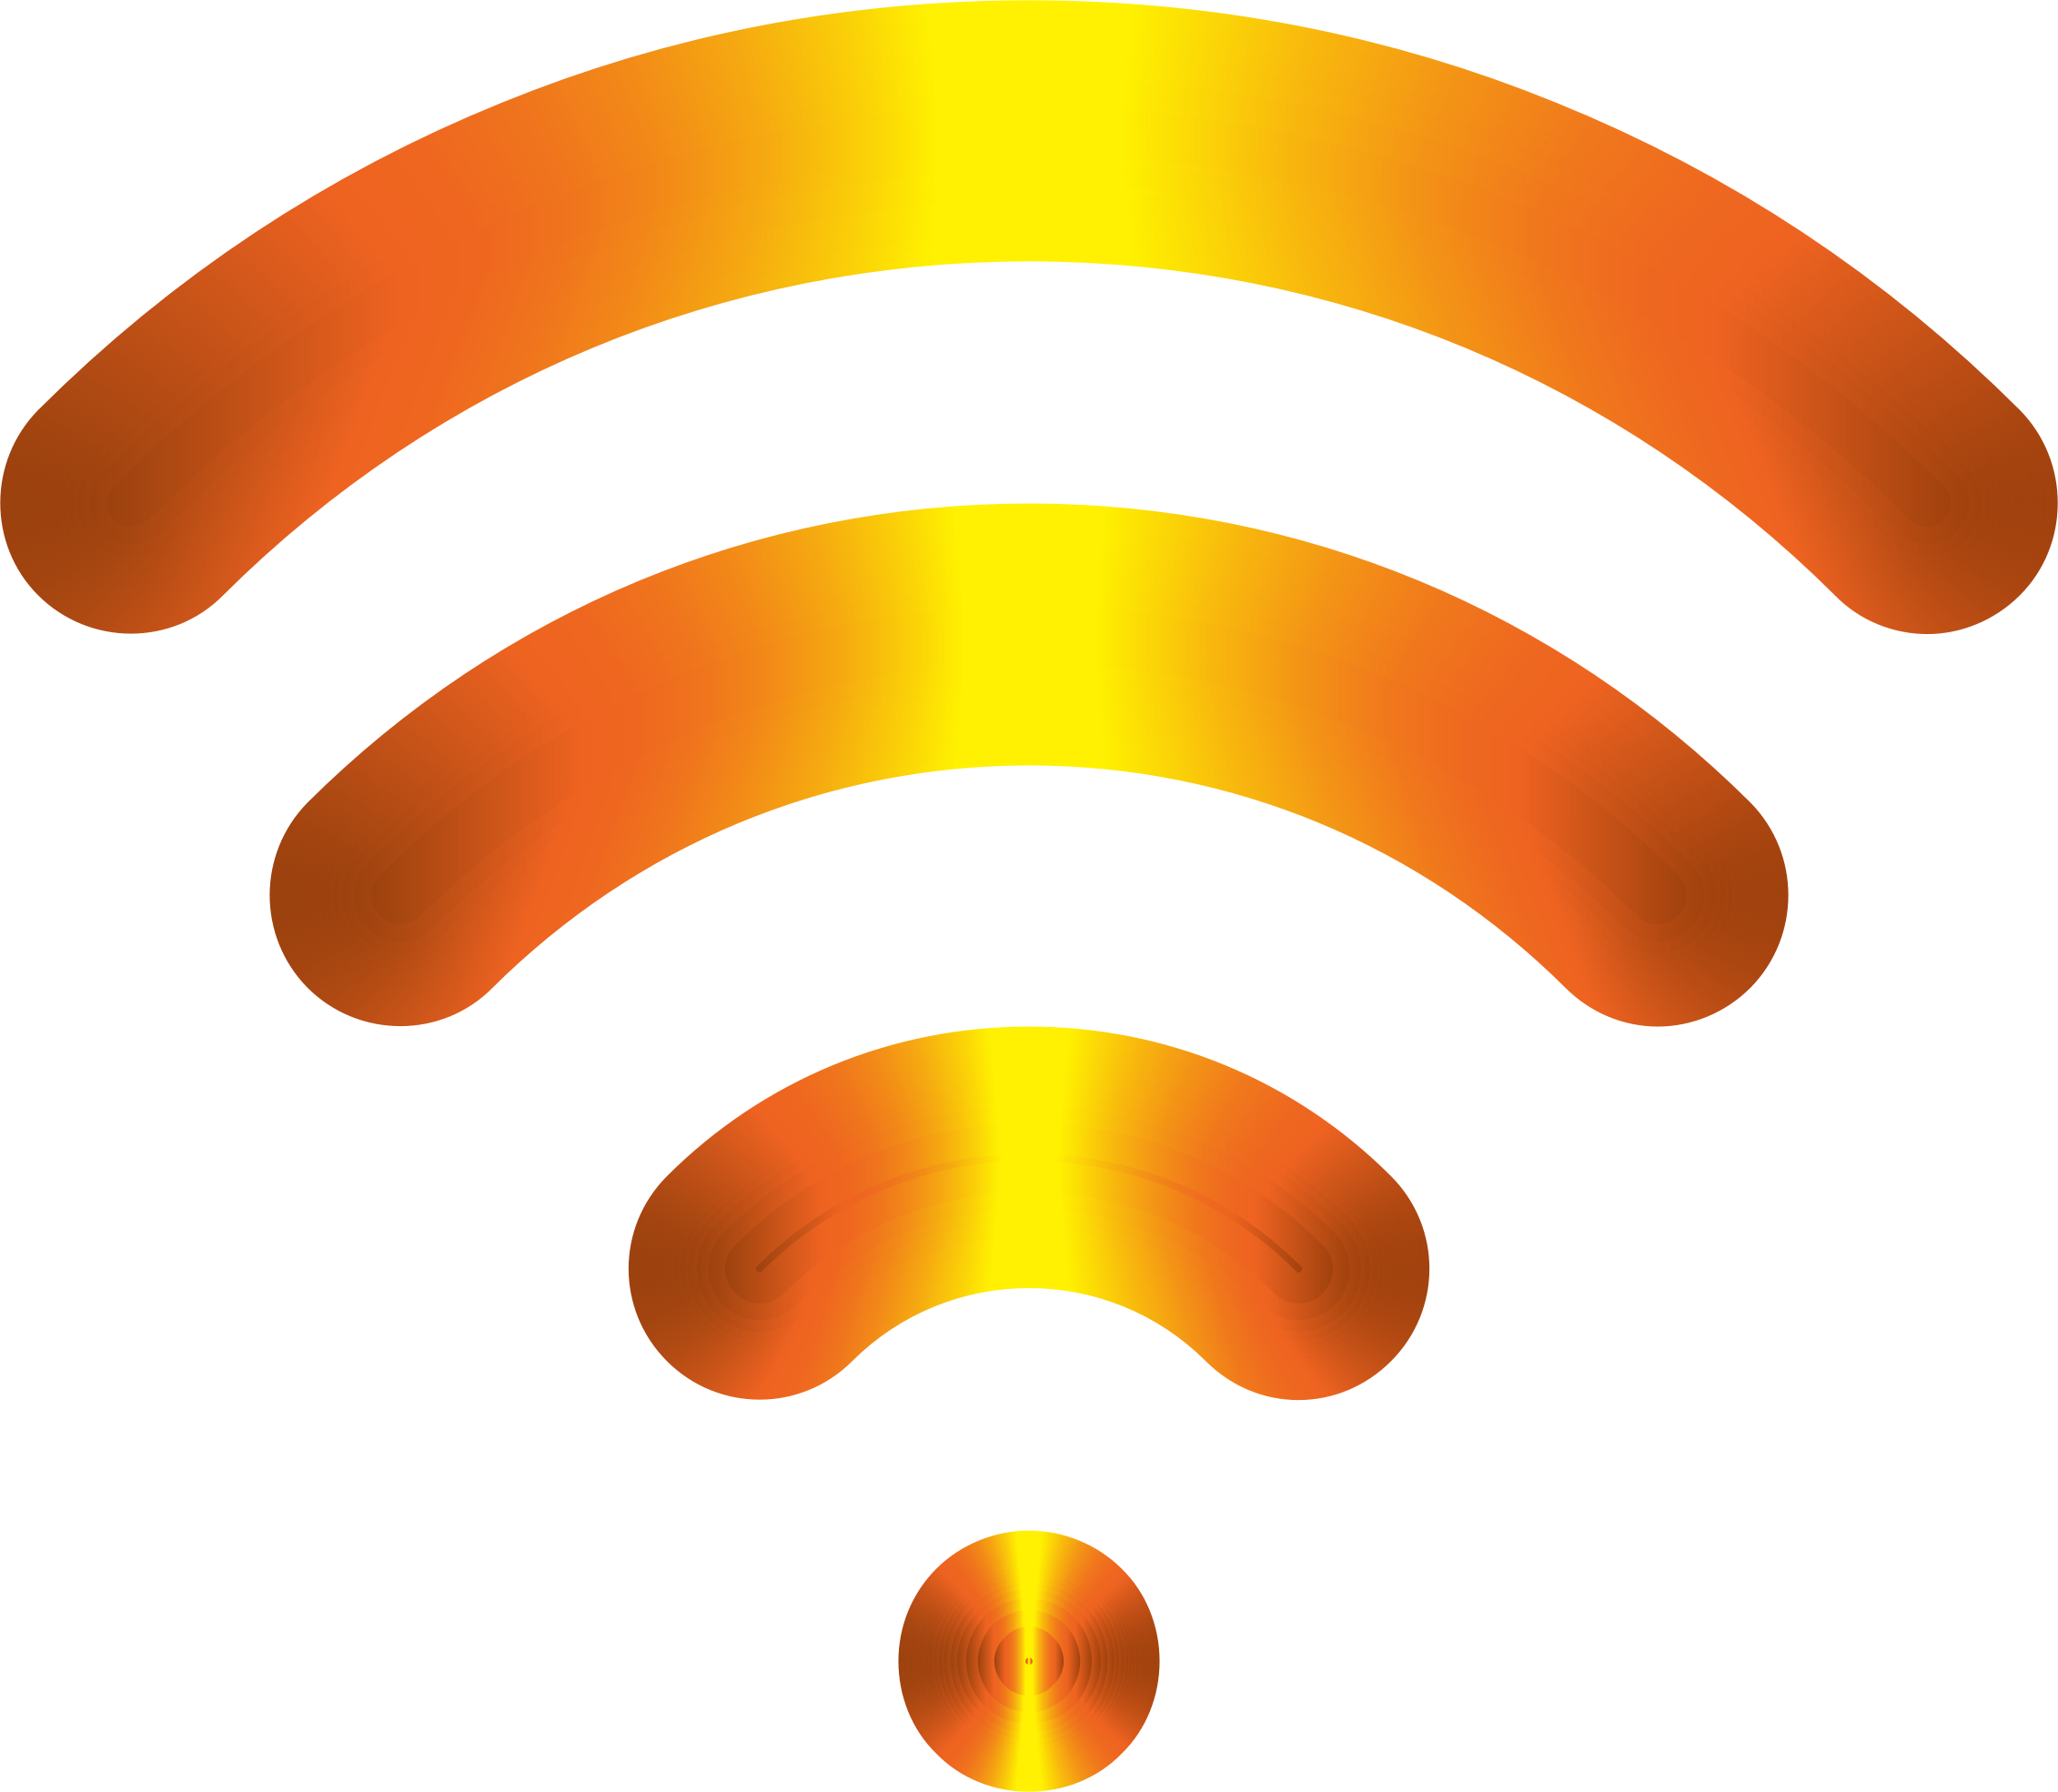 Wireless signal clipart.